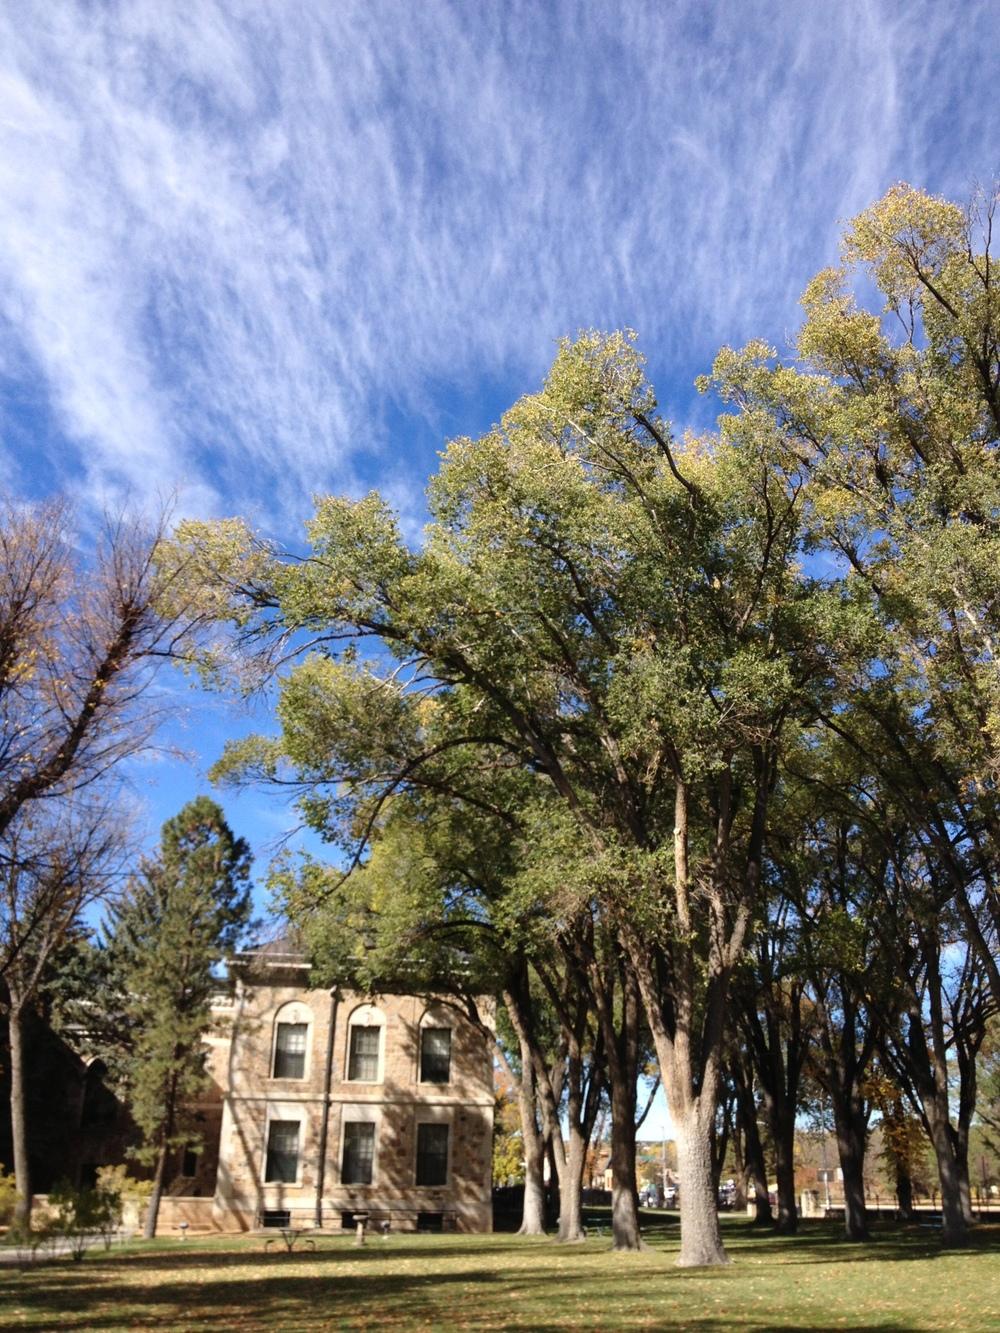 santa fe clouds and trees.jpg